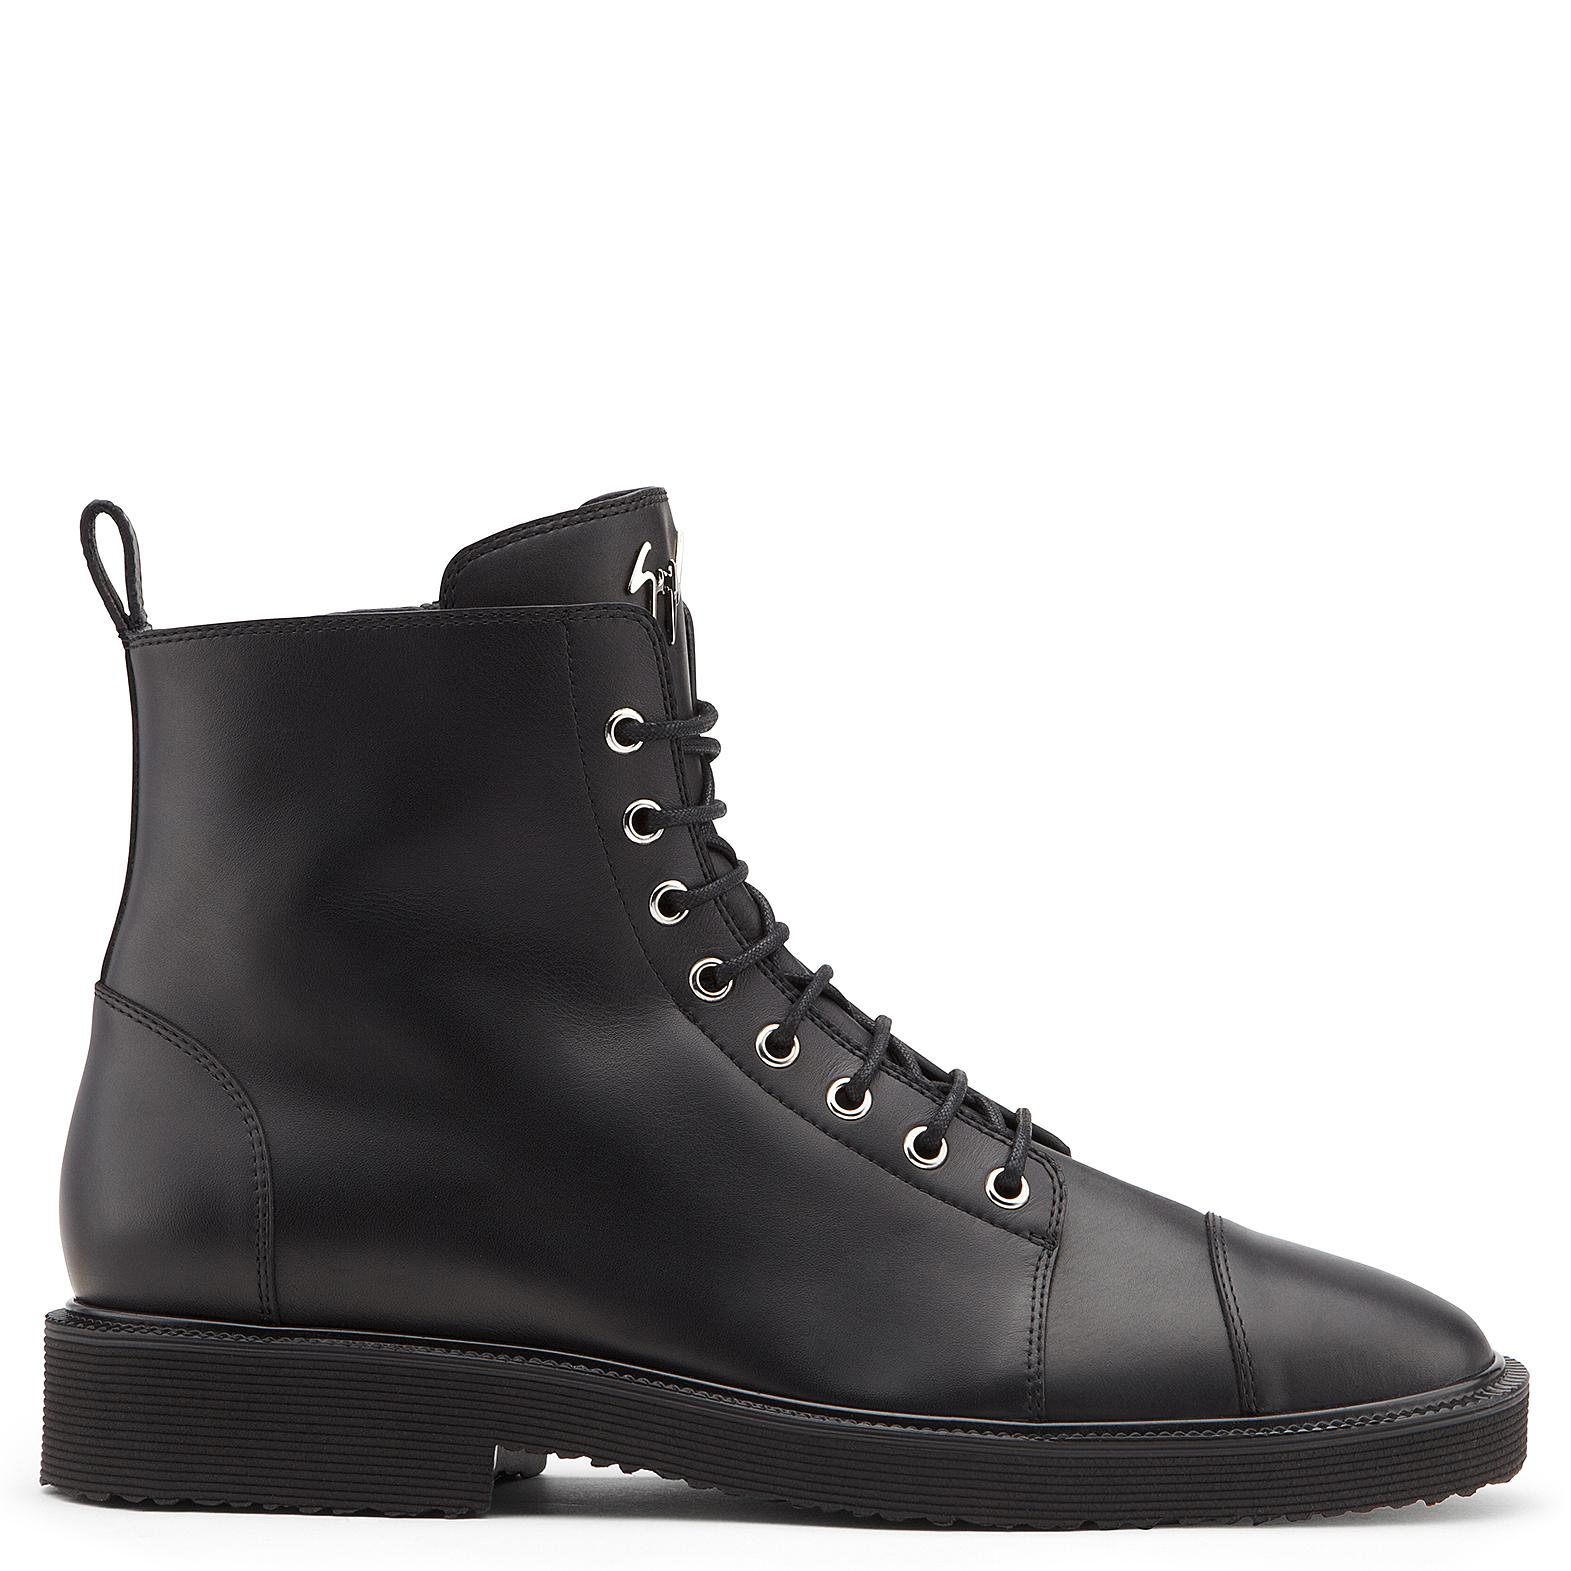 Giuseppe Zanotti Calfskin leather boot with metal zips and buckles CAMERON XV5hHtt